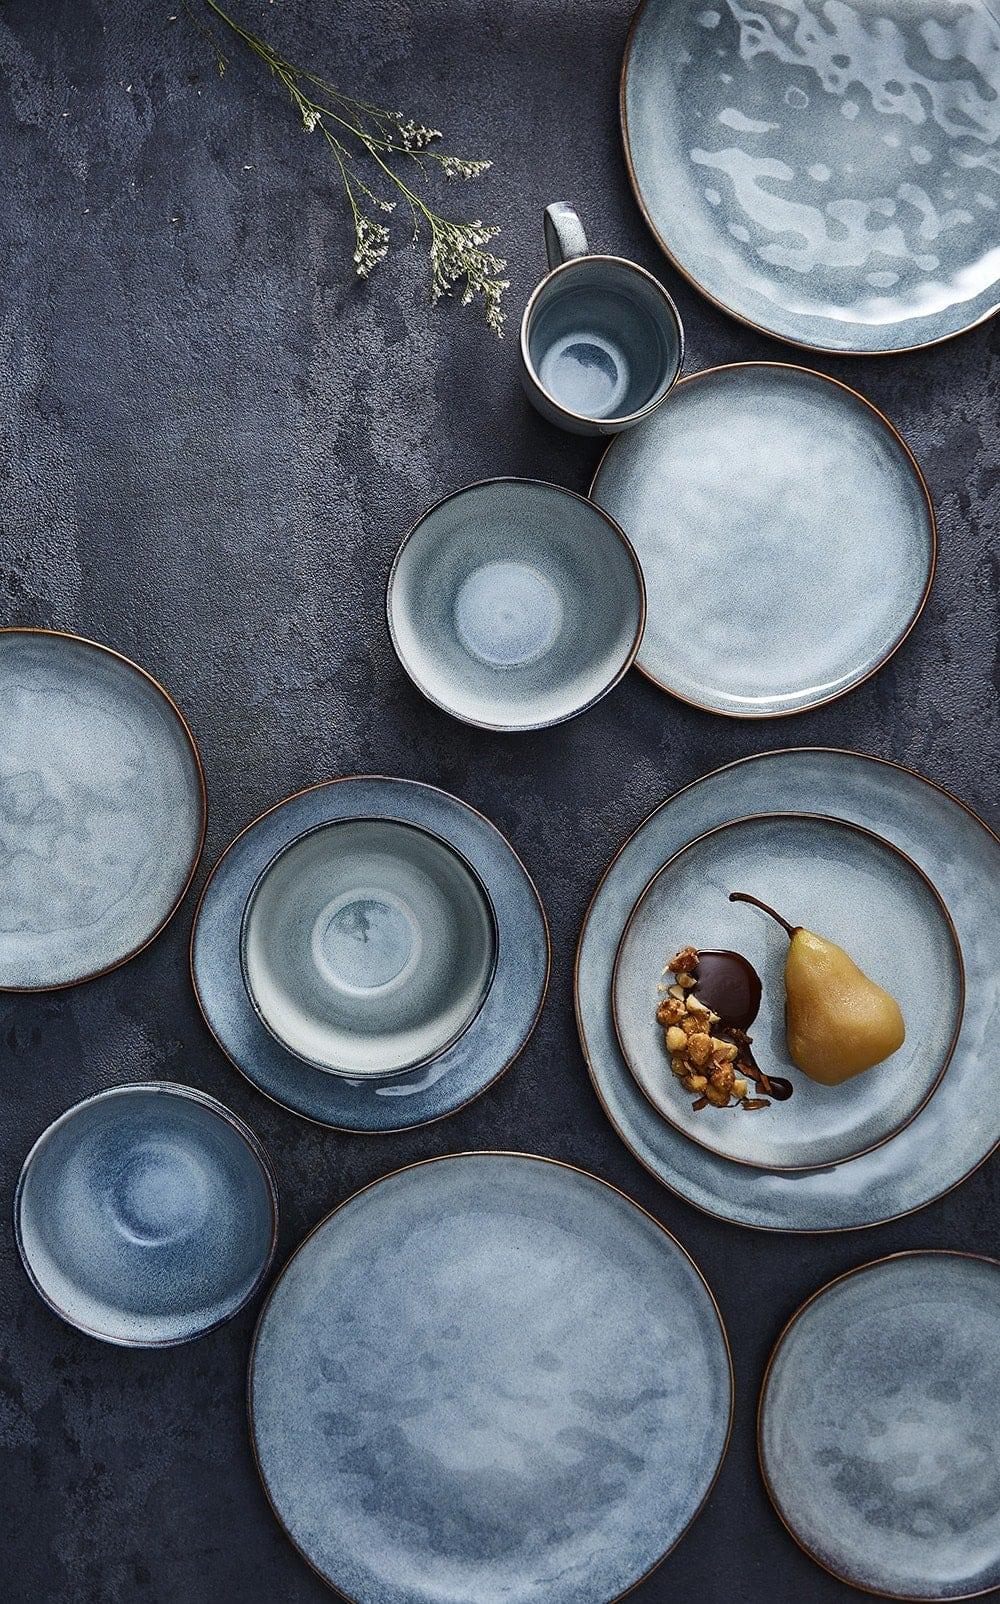 target homewares 2018 blue handmade dinnerware with gold trim